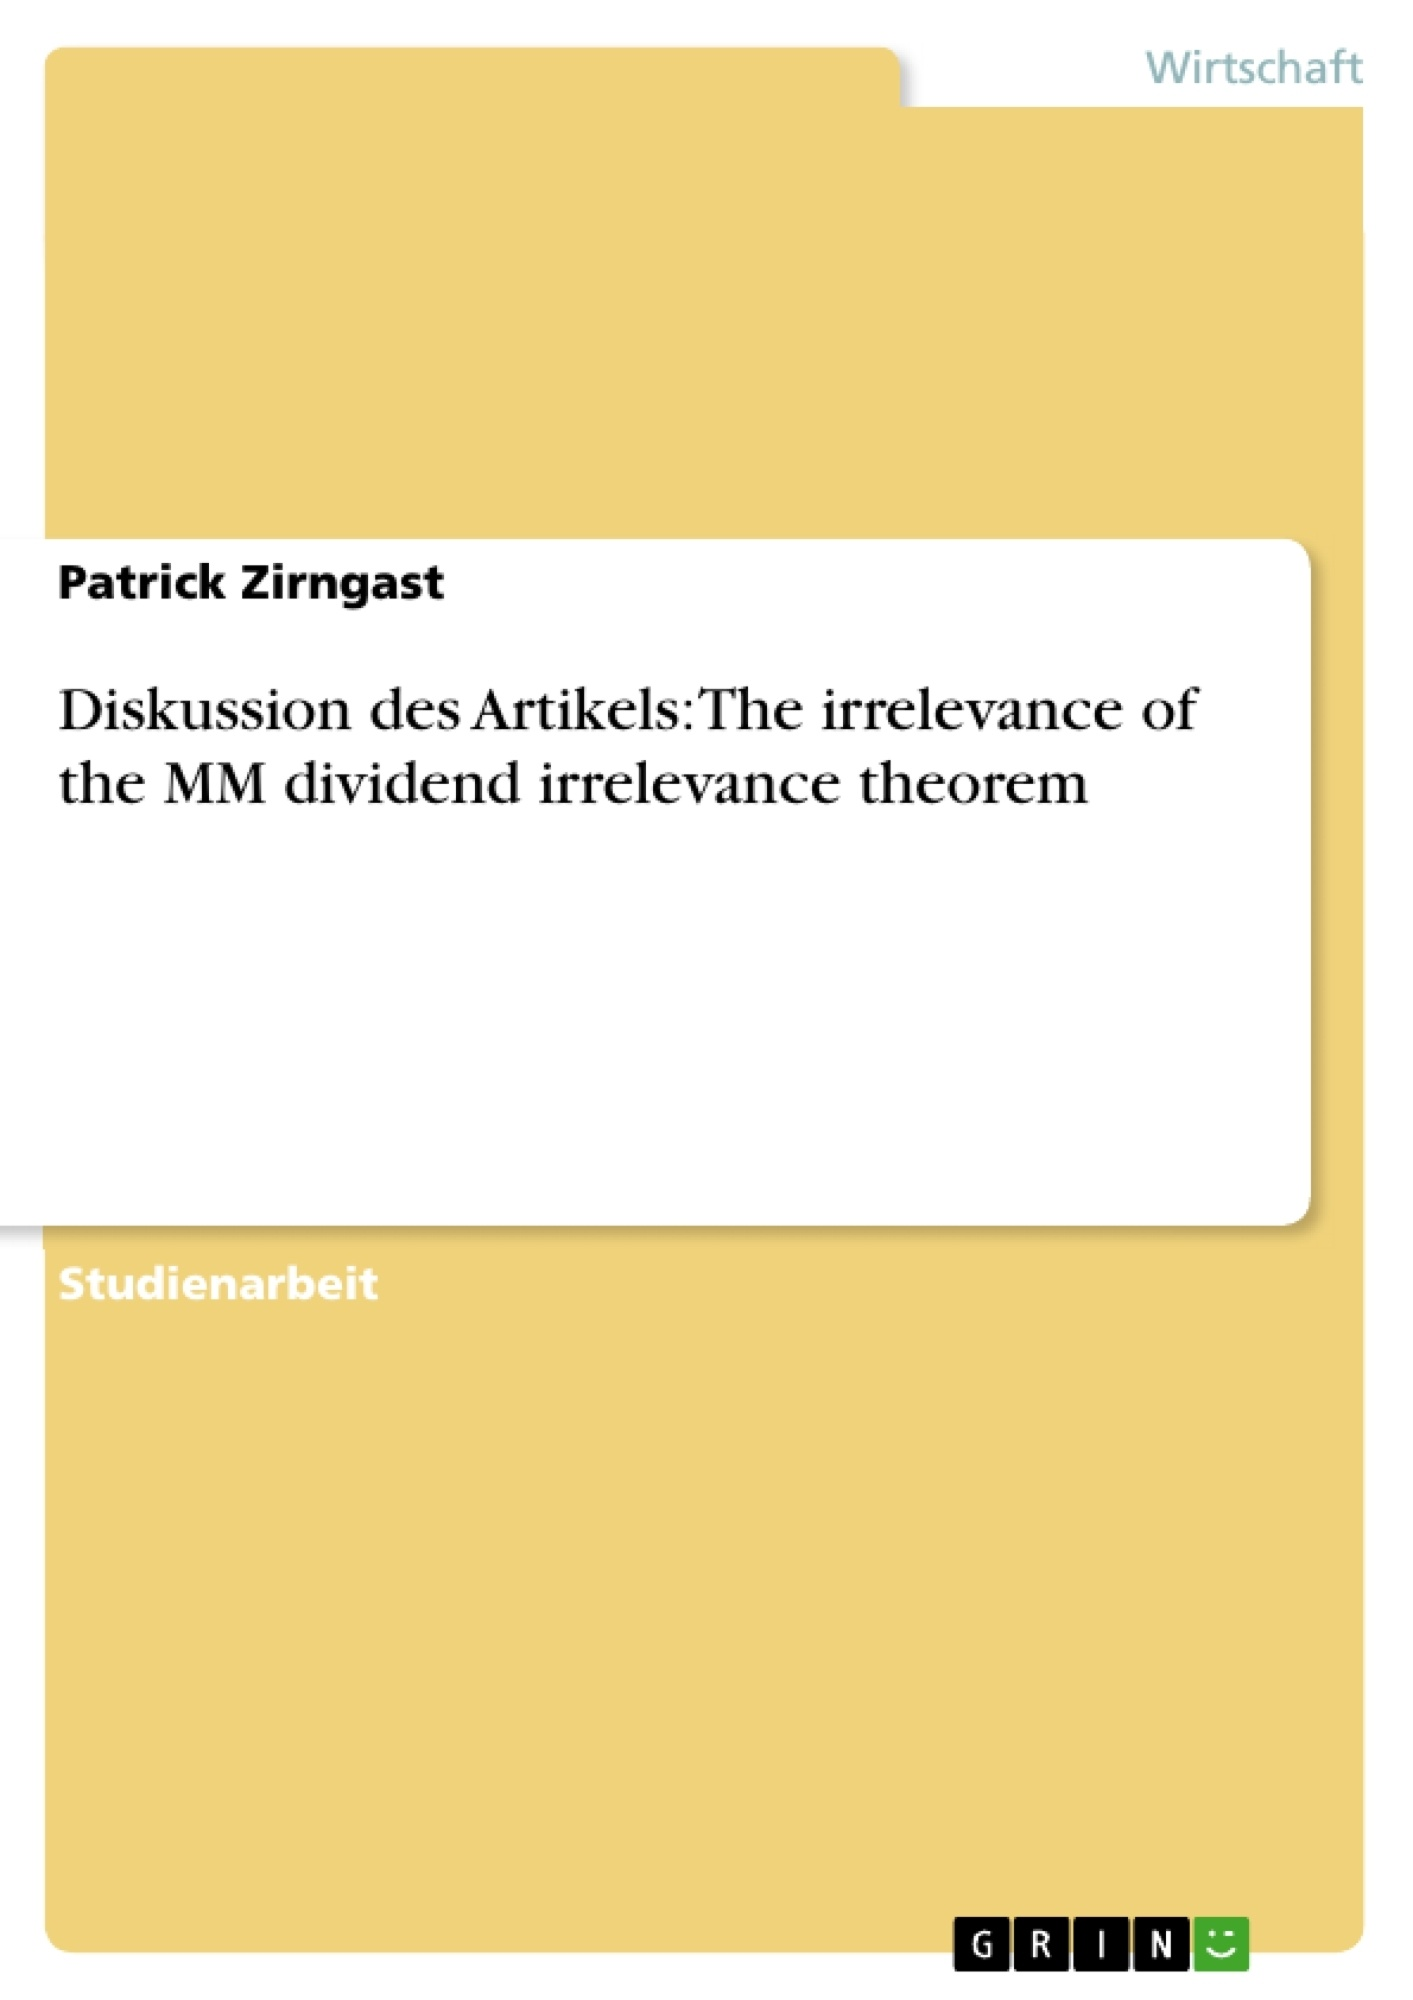 Titel: Diskussion des Artikels: The irrelevance of the MM dividend irrelevance theorem